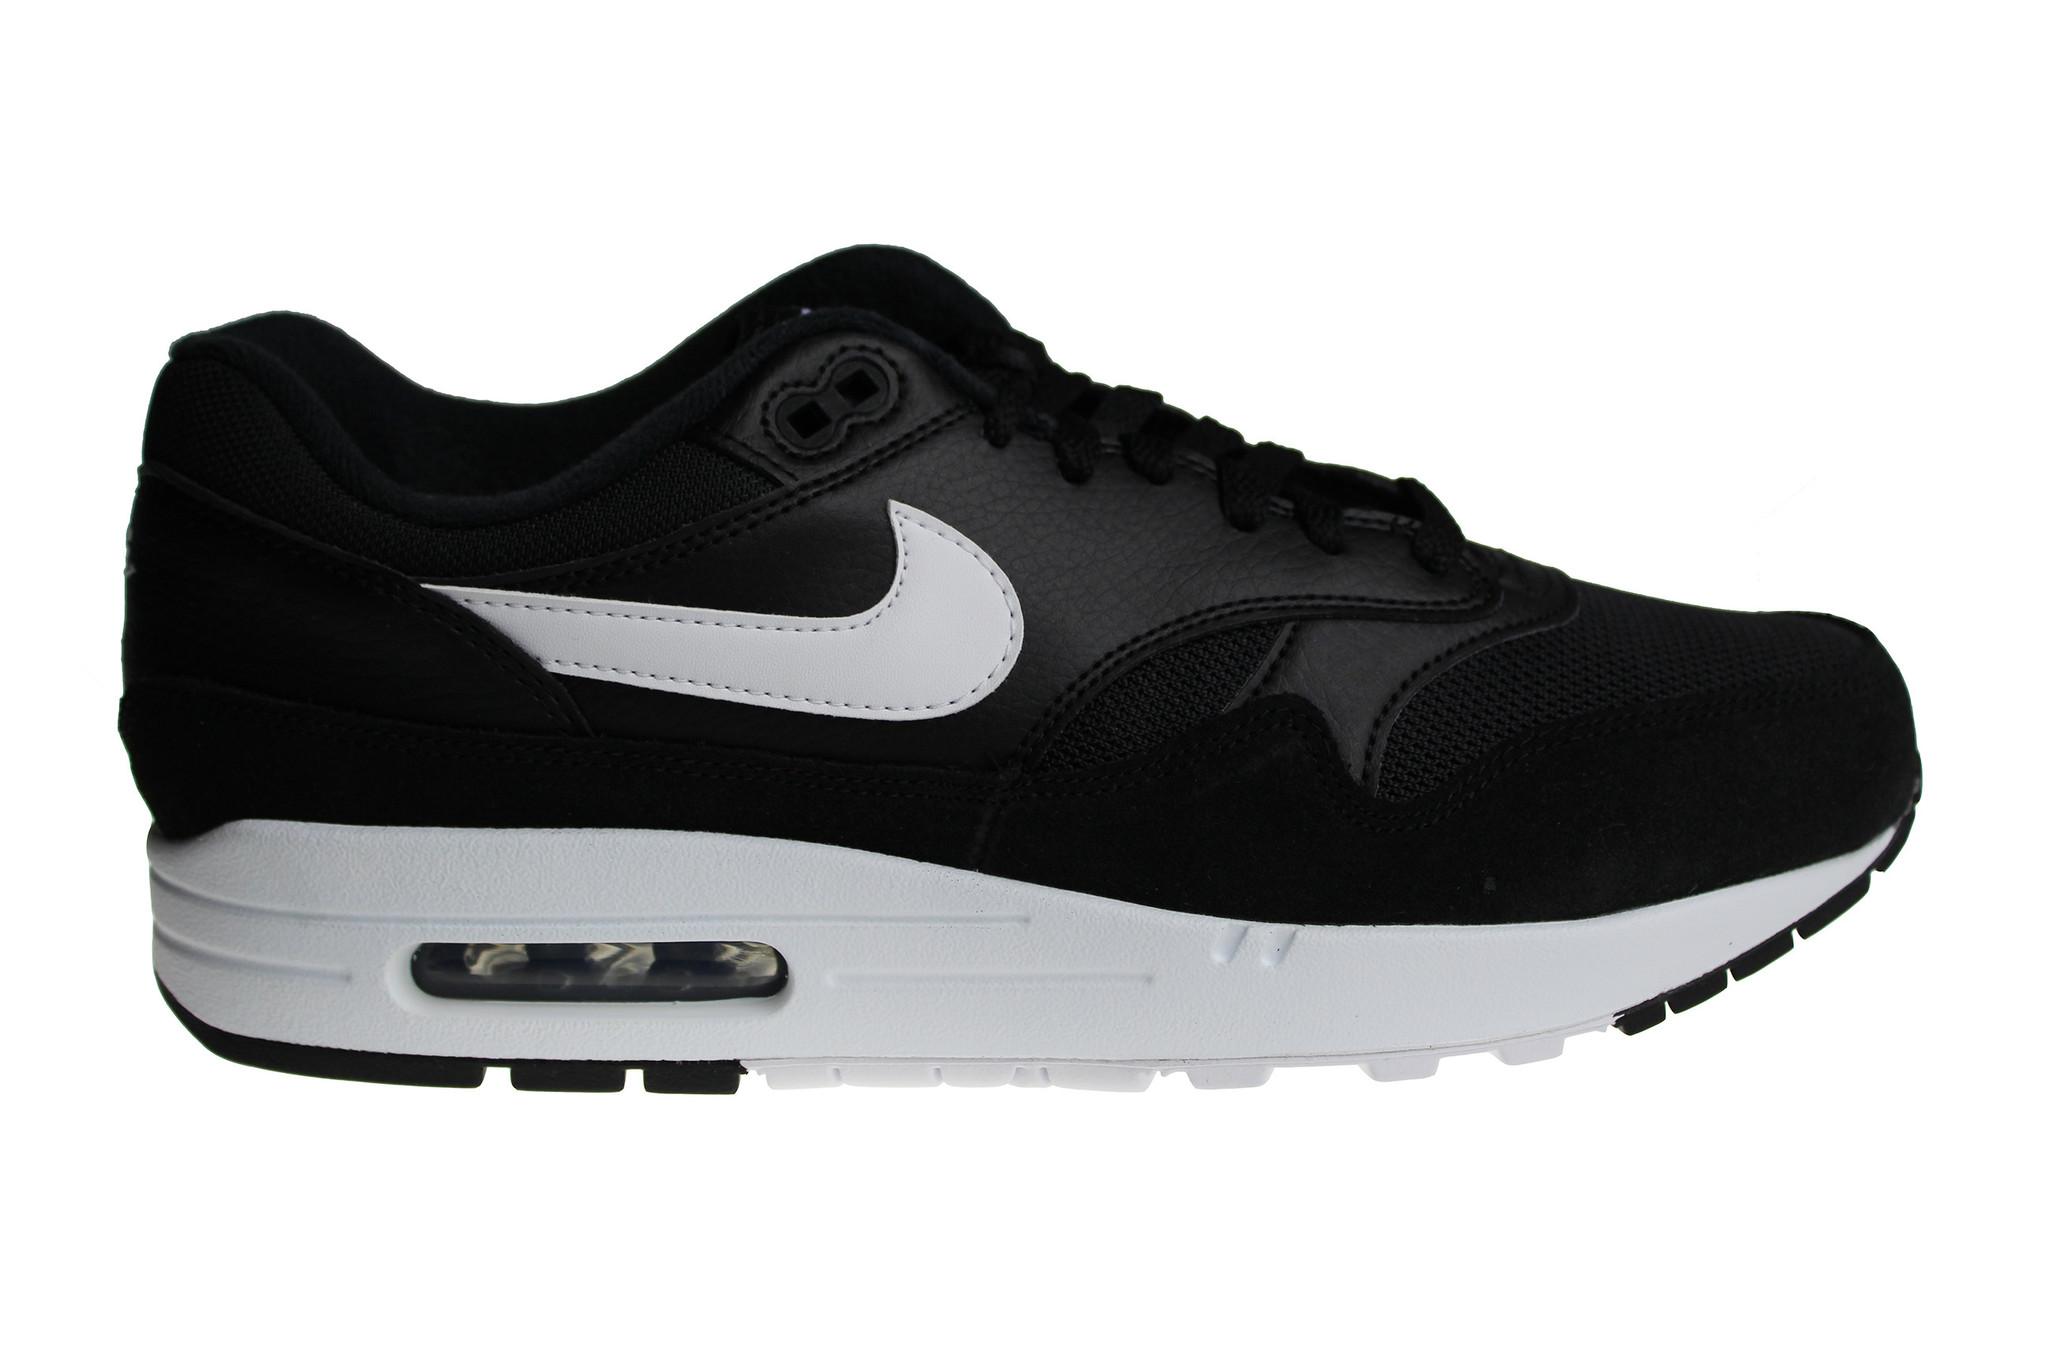 Nike Air Max 1 (BlackWhite) AH8145 014 Men's